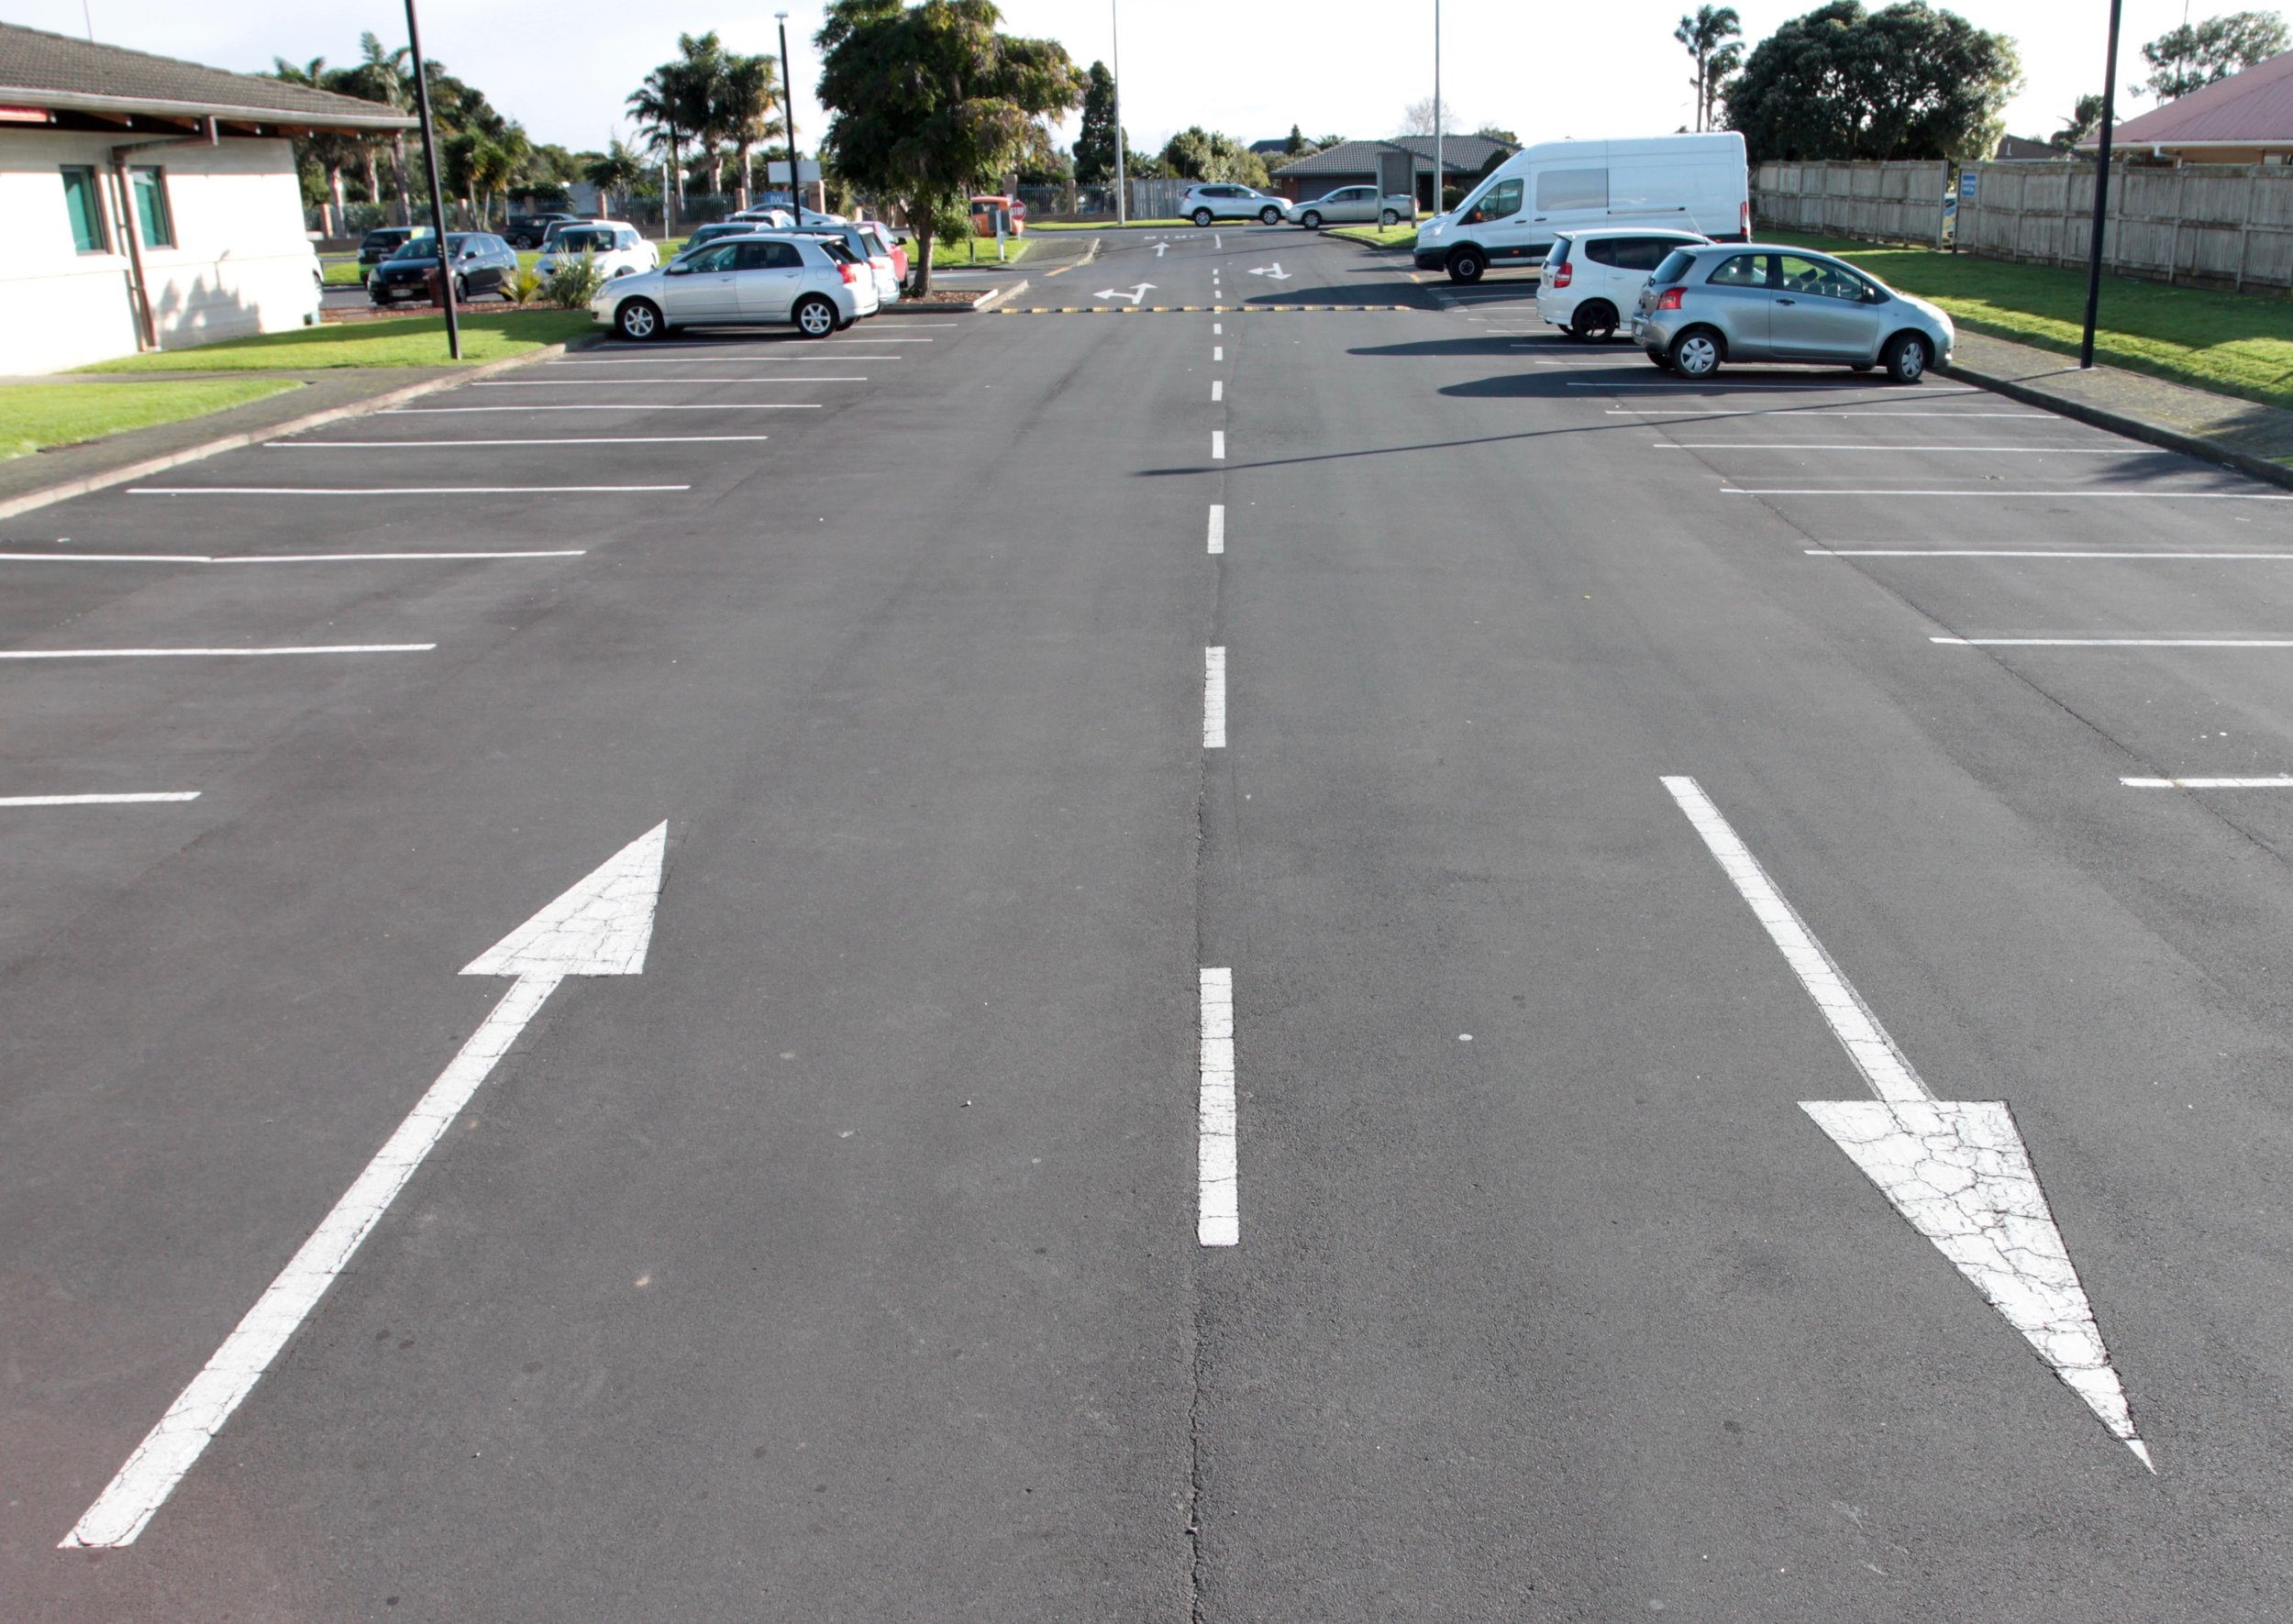 Car Park Carpark White Lines Arrow